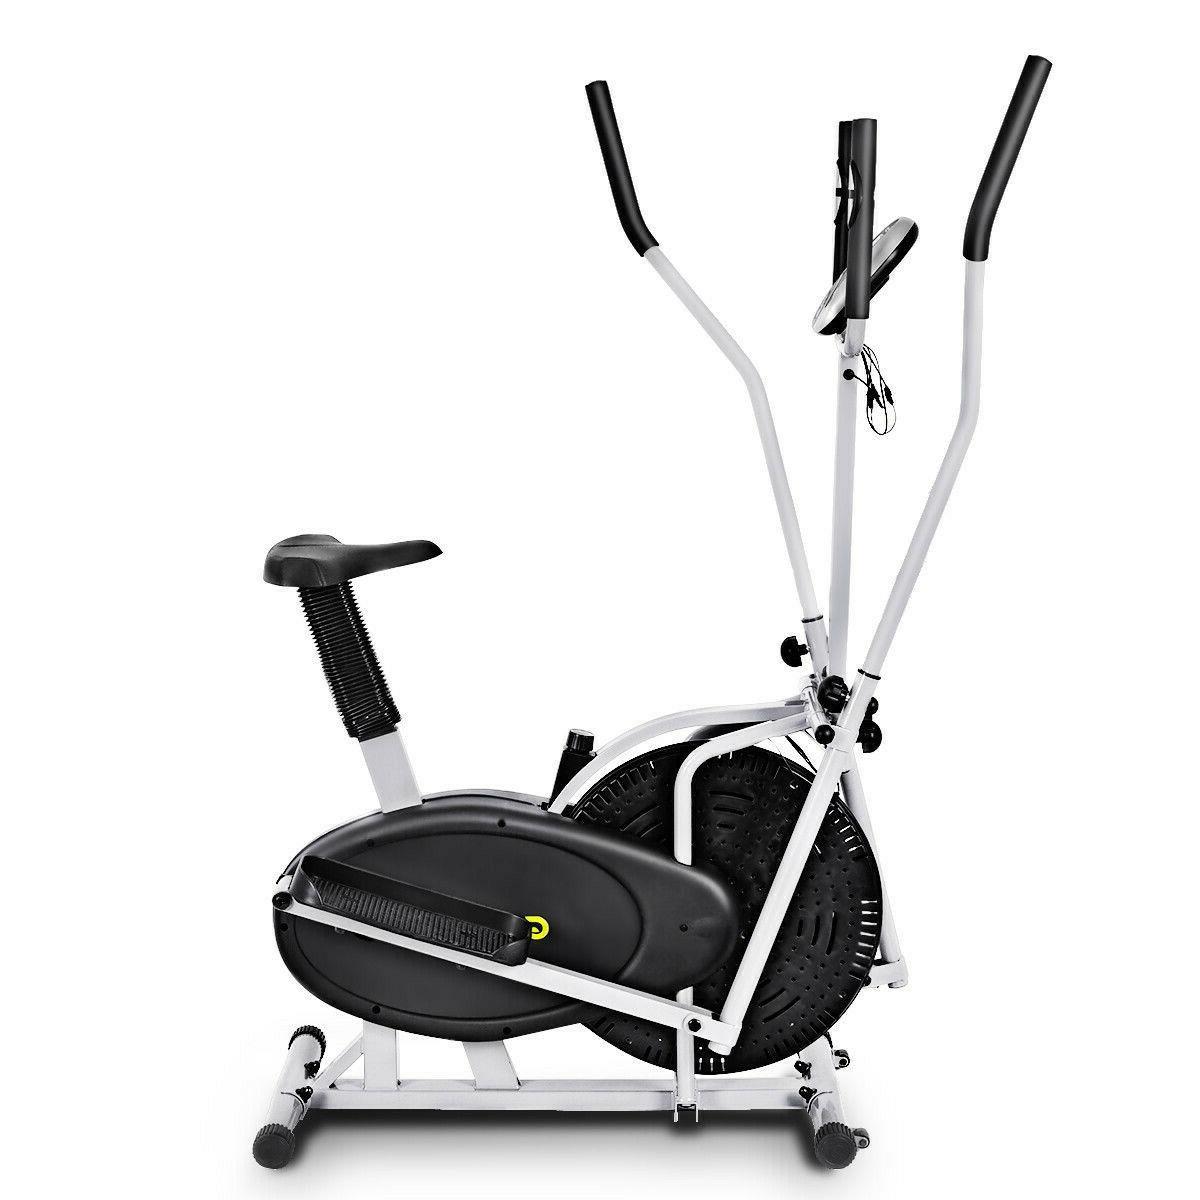 2 1 Bike Exercise Fitness Machine